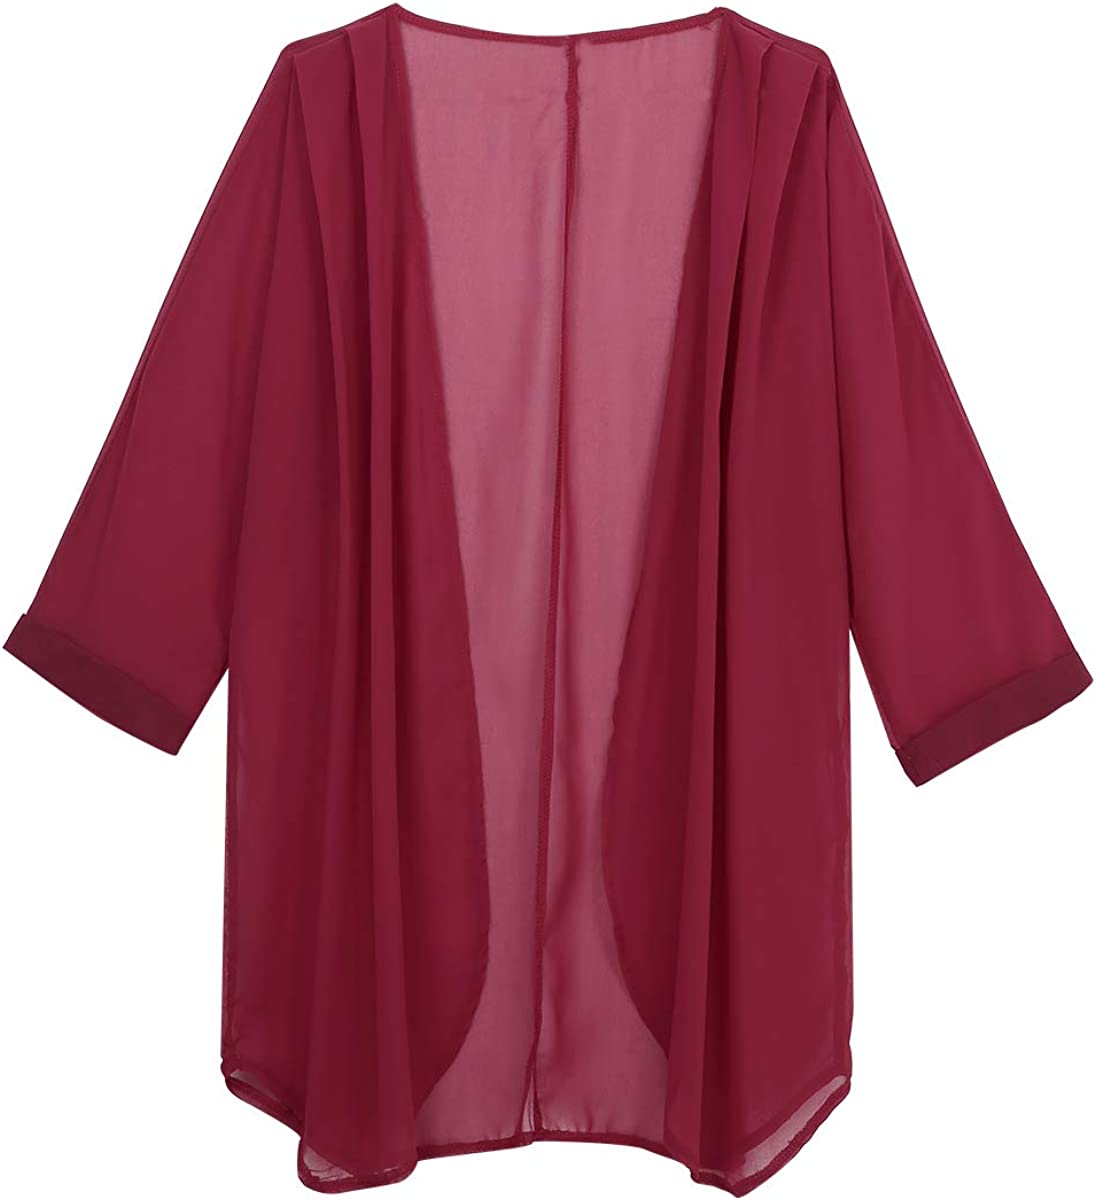 YiZYiF Women's 3/4 Sleeve Open Front Sheer Chiffon Long Cardigan Bolero Shrug Jackets